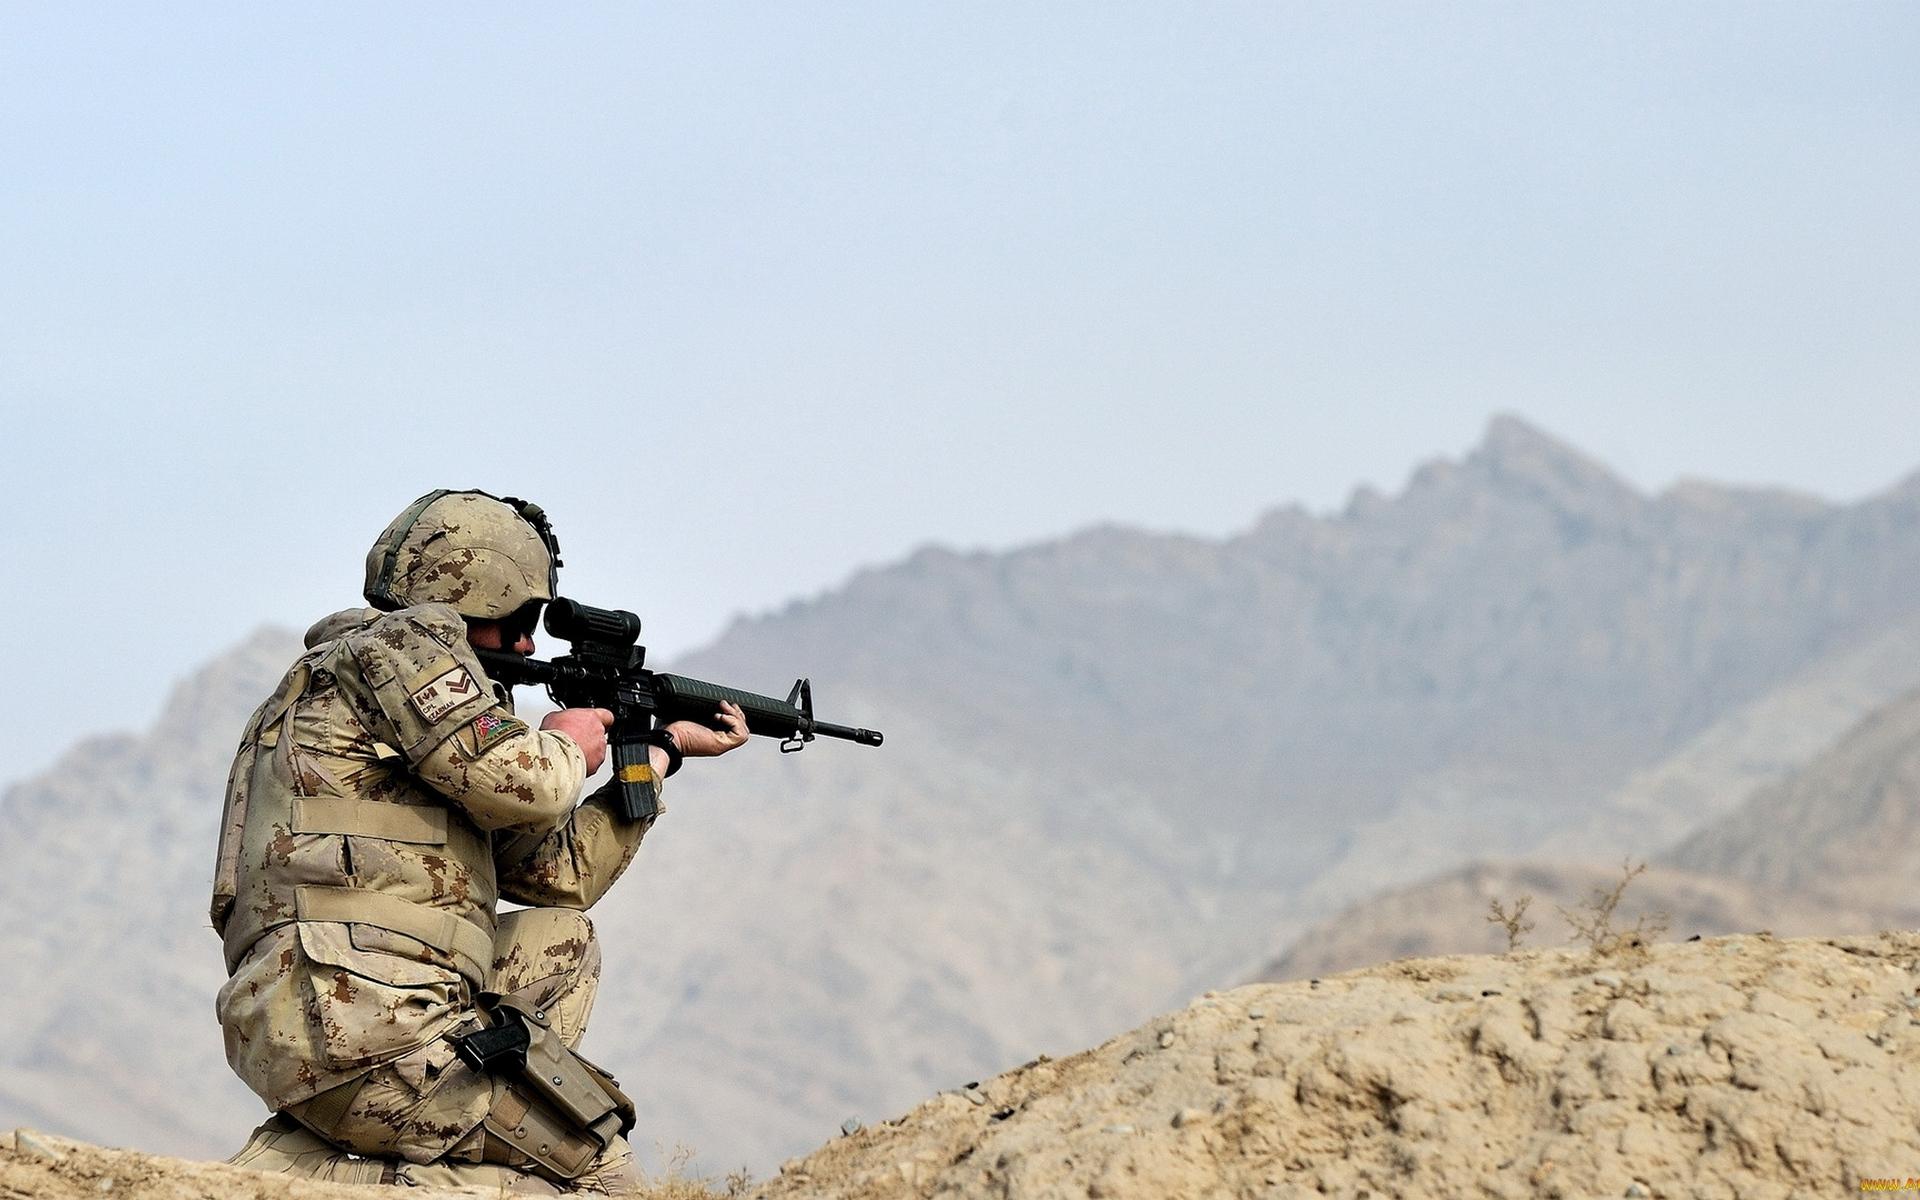 обои солдат, амуниция, шлем, оружие картинки фото